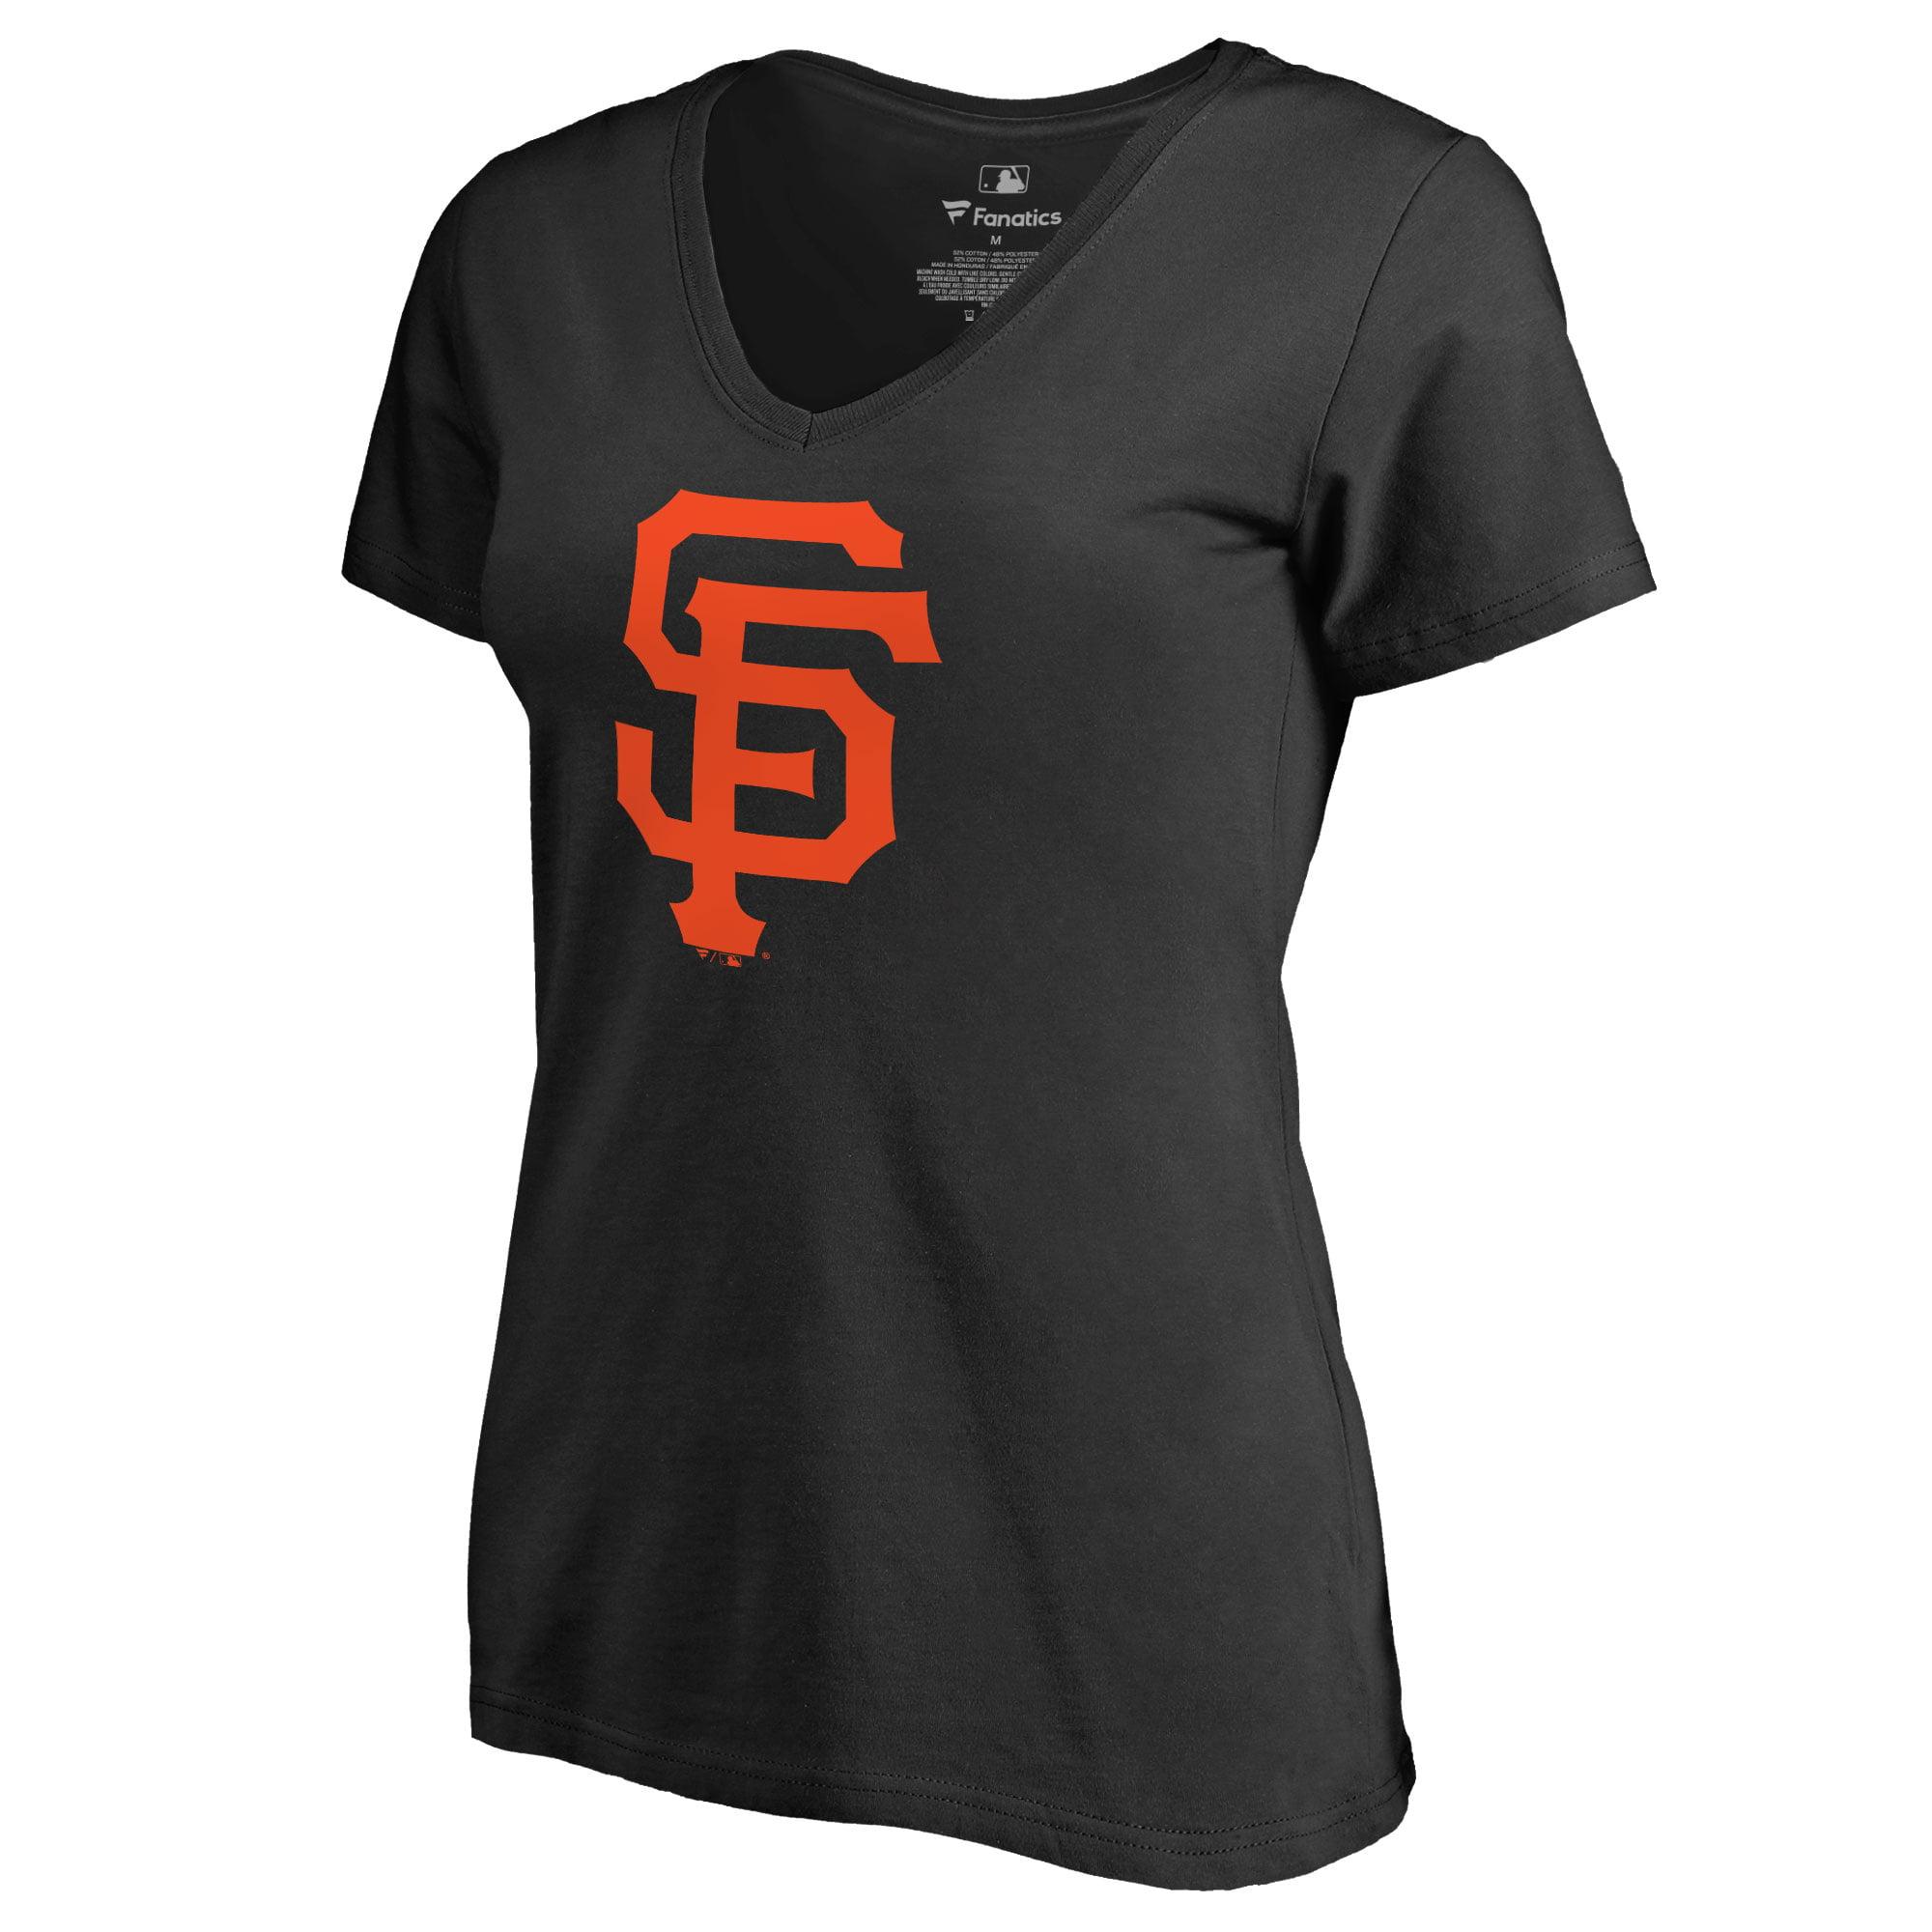 San Francisco Giants Women's Team Color Primary Logo V-Neck T-Shirt - Black